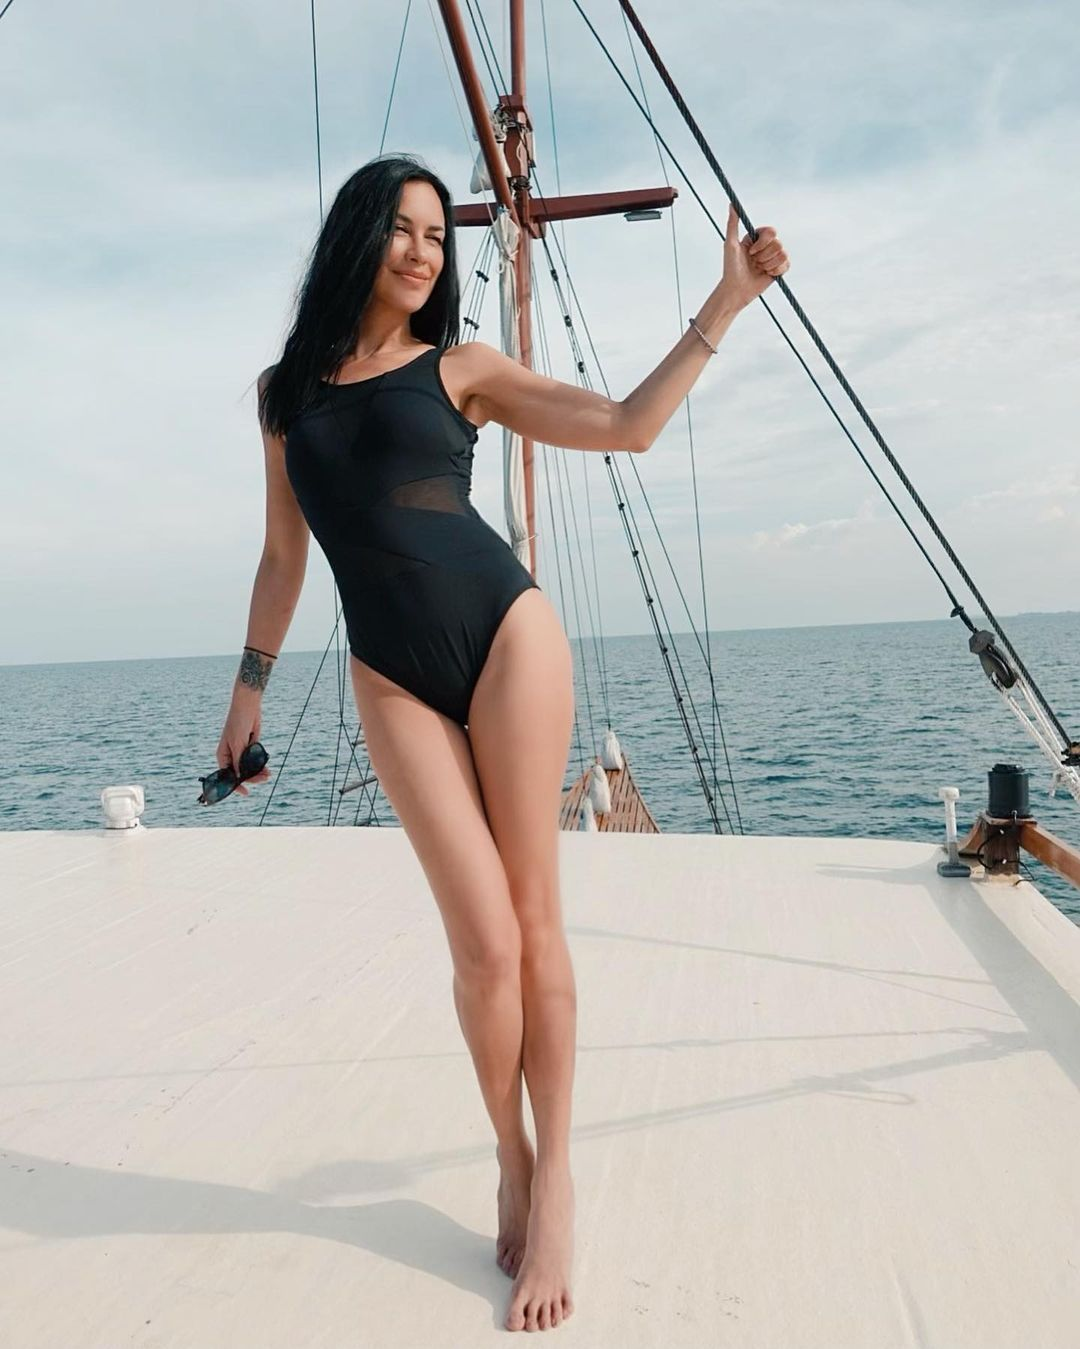 Sophia Latjuba Seksi di Usia 50, Intip Pola Makannya Yuk!